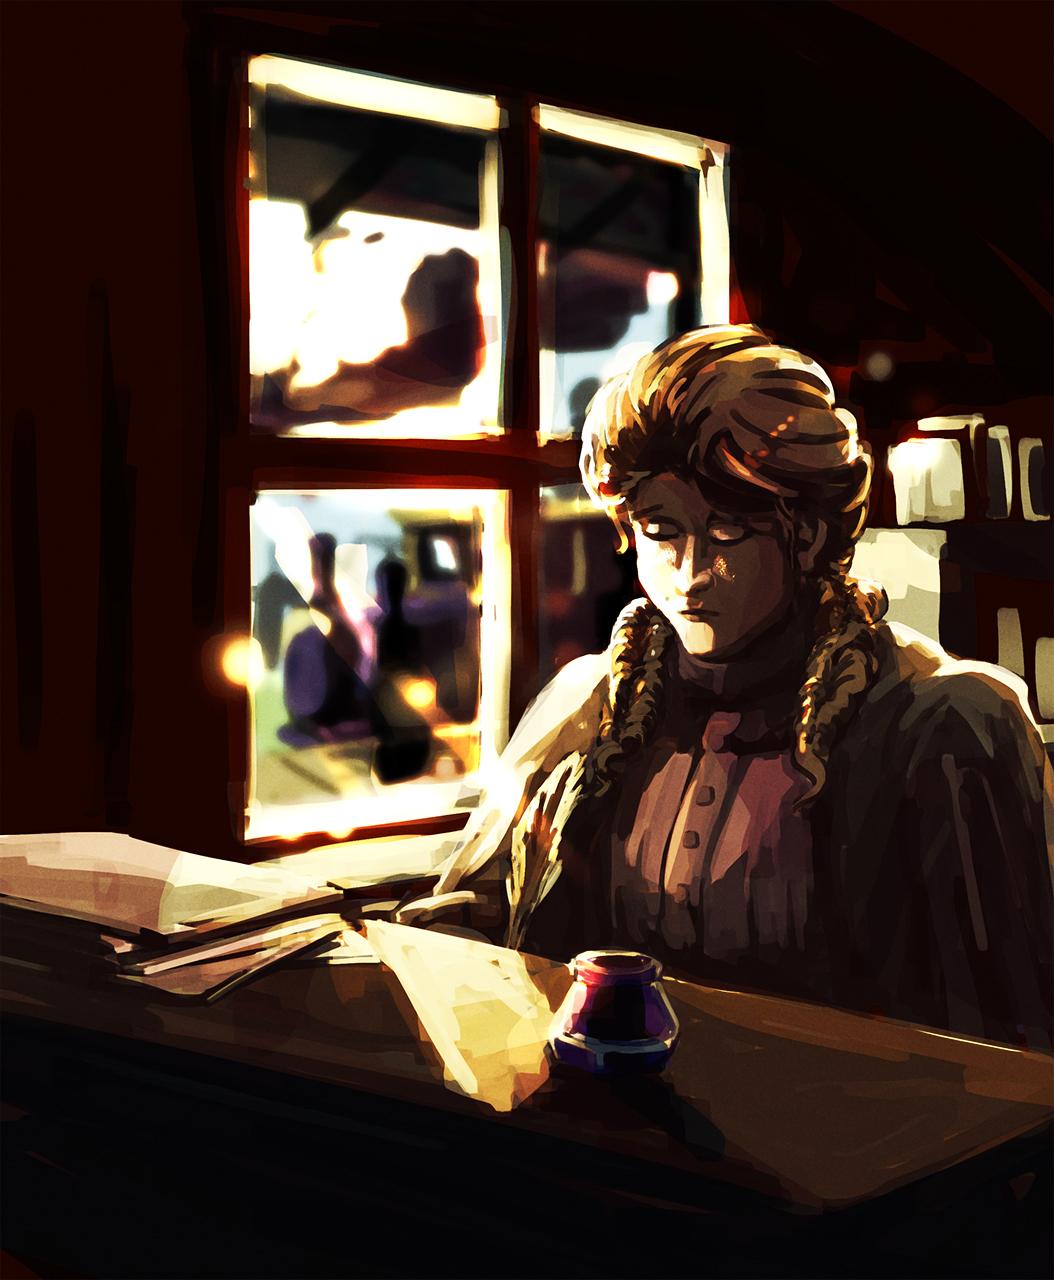 Rework: Mary-Beth Gaskill